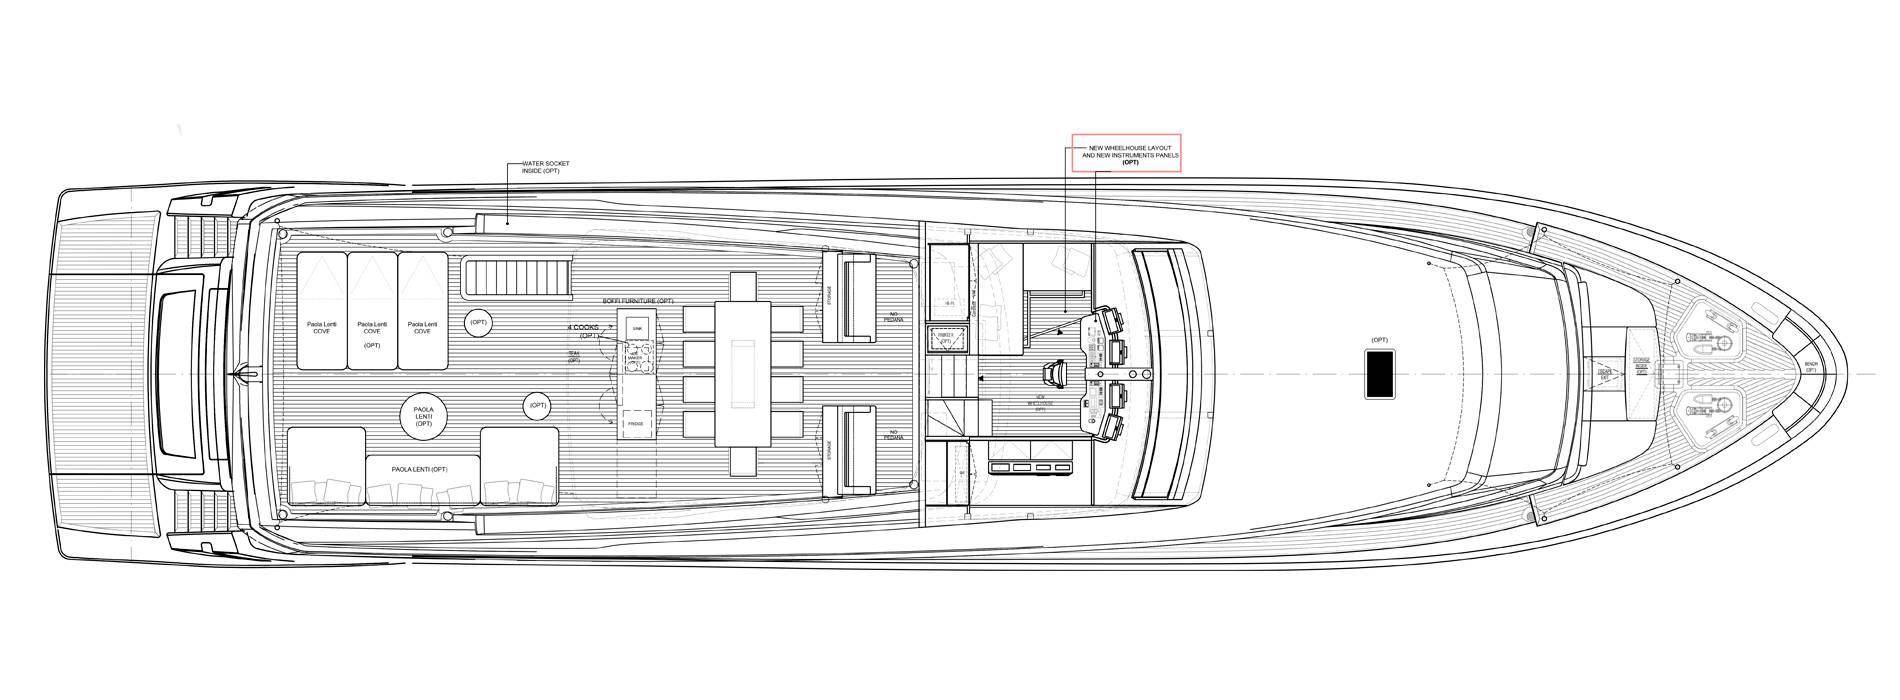 Sanlorenzo Yachts SL106-625 飞桥